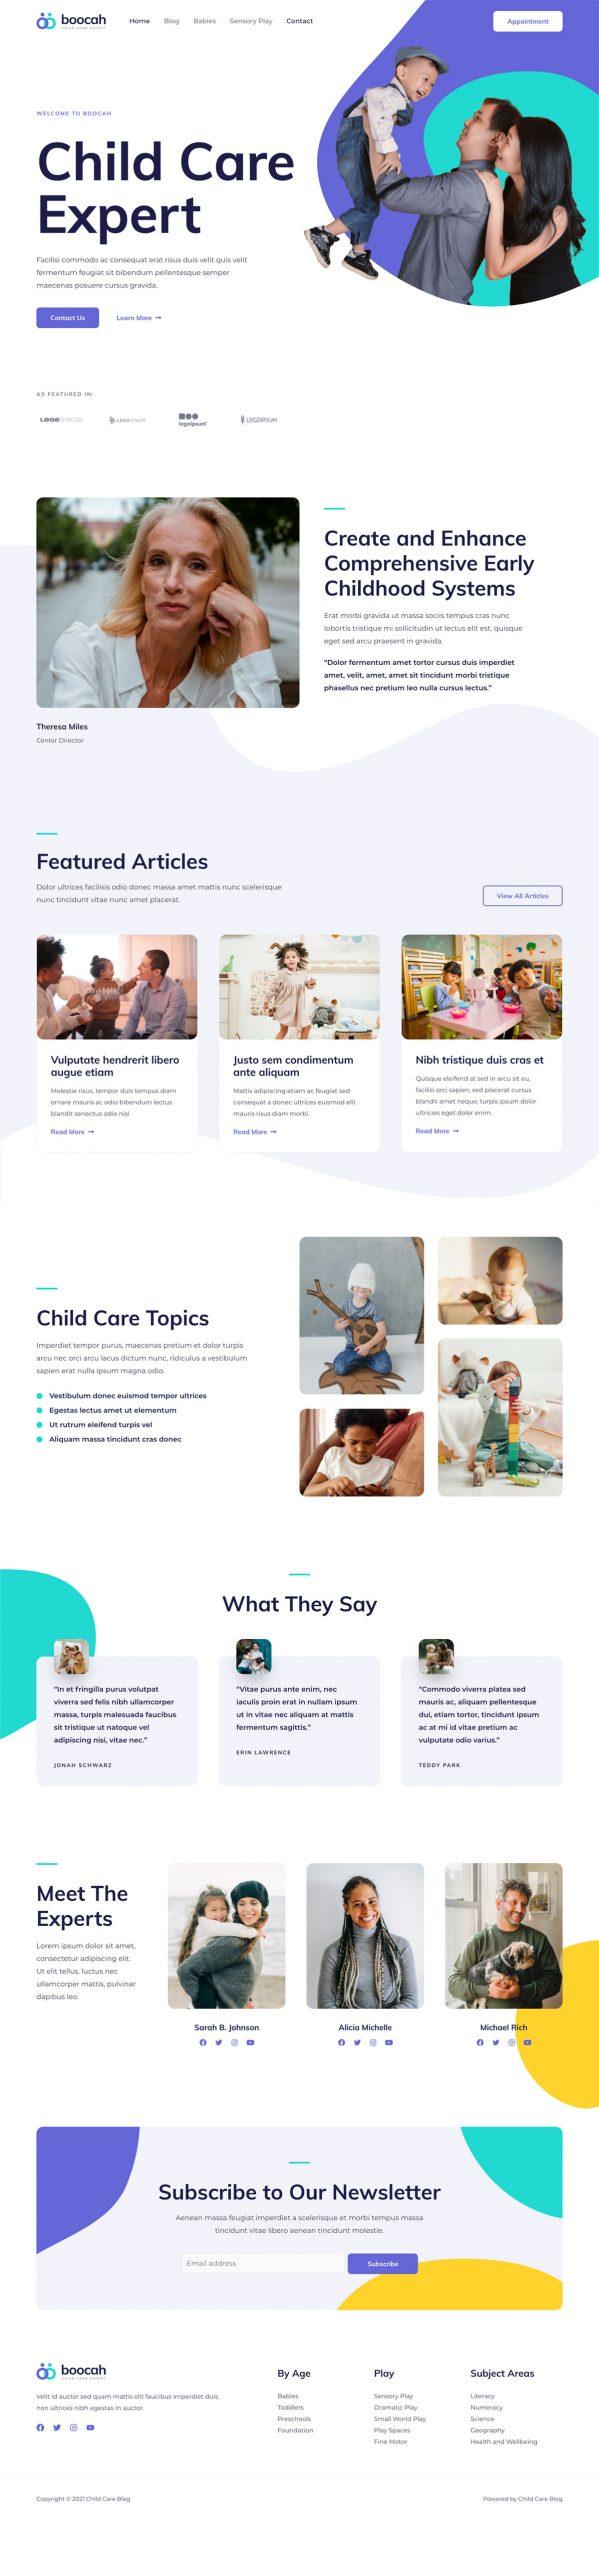 Adamo Web Design | Web Design Durham | childcare blog 02 home scaled